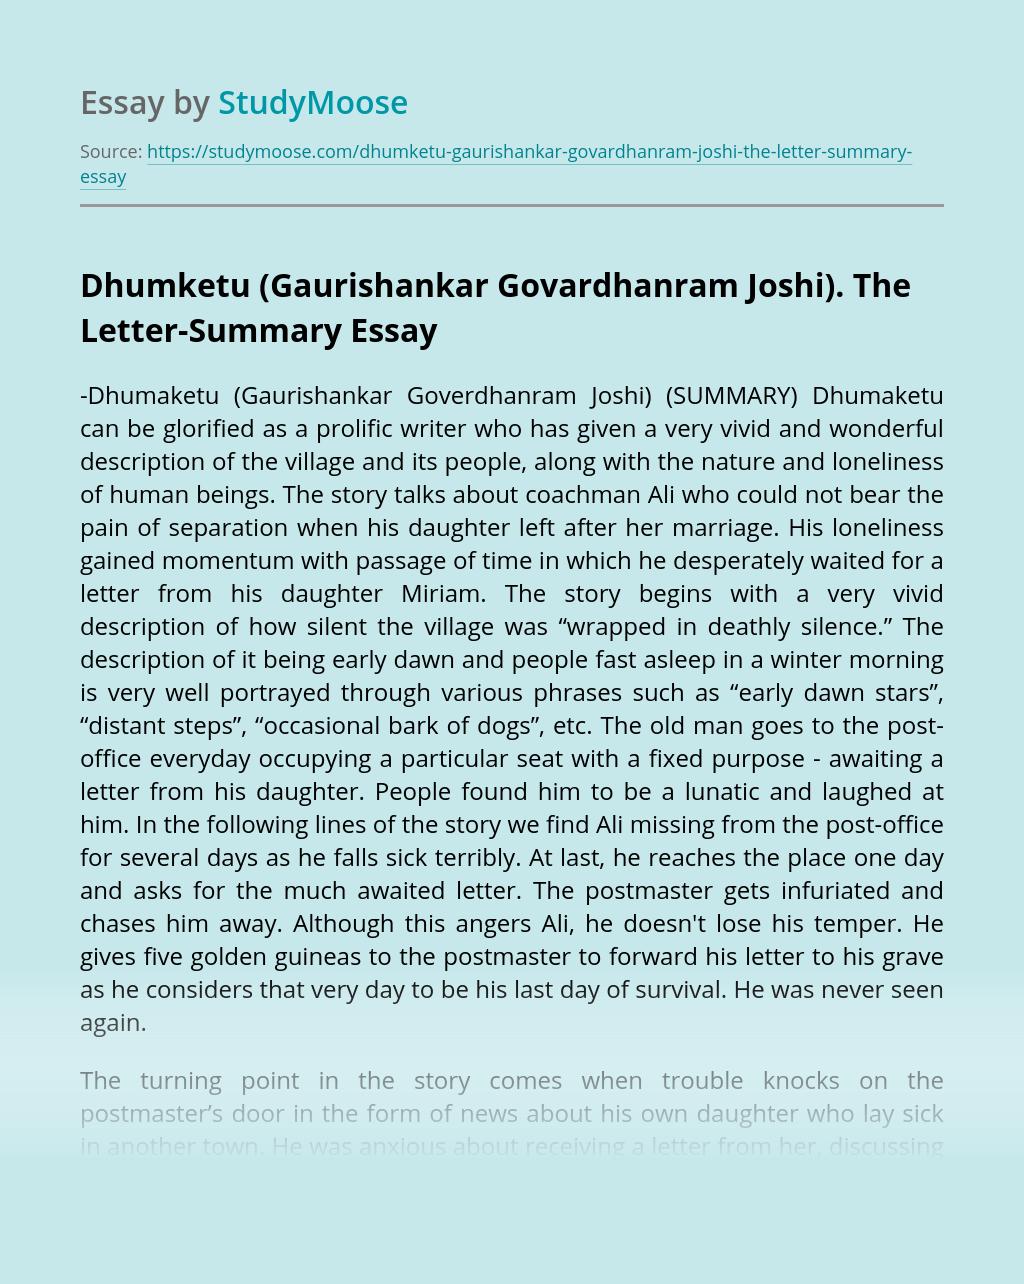 Dhumketu (Gaurishankar Govardhanram Joshi). The Letter-Summary